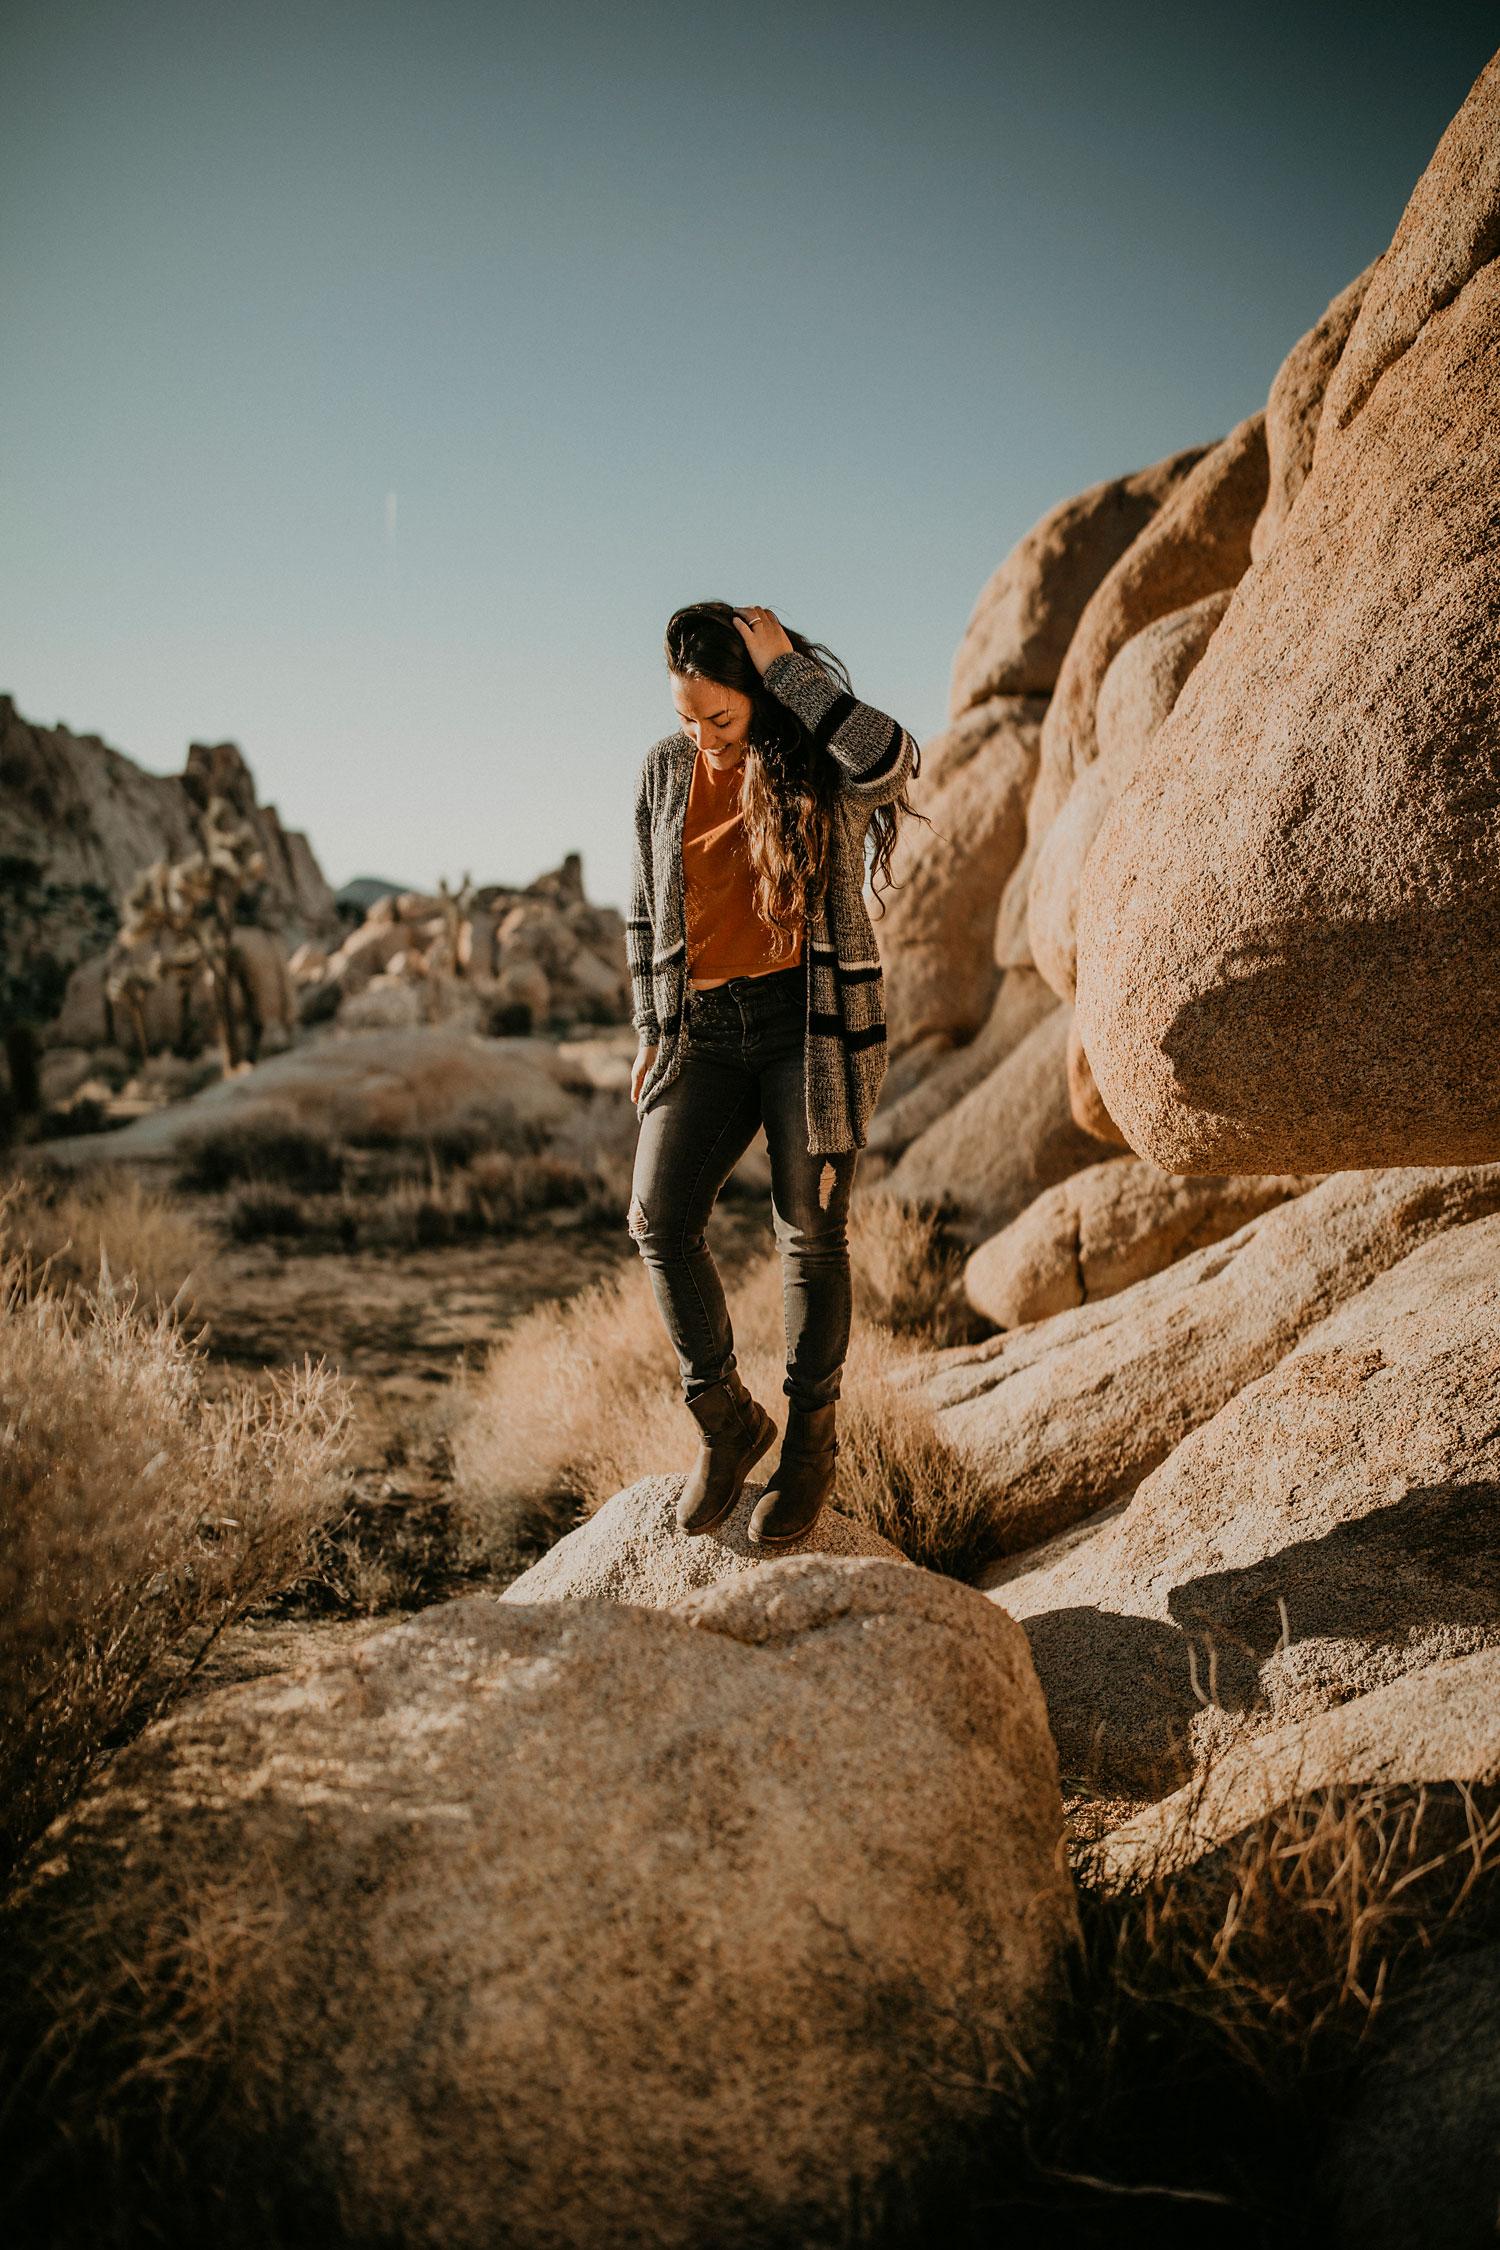 Joshua-Tree-Travel-Photographer-Self-Portraits-06.jpg